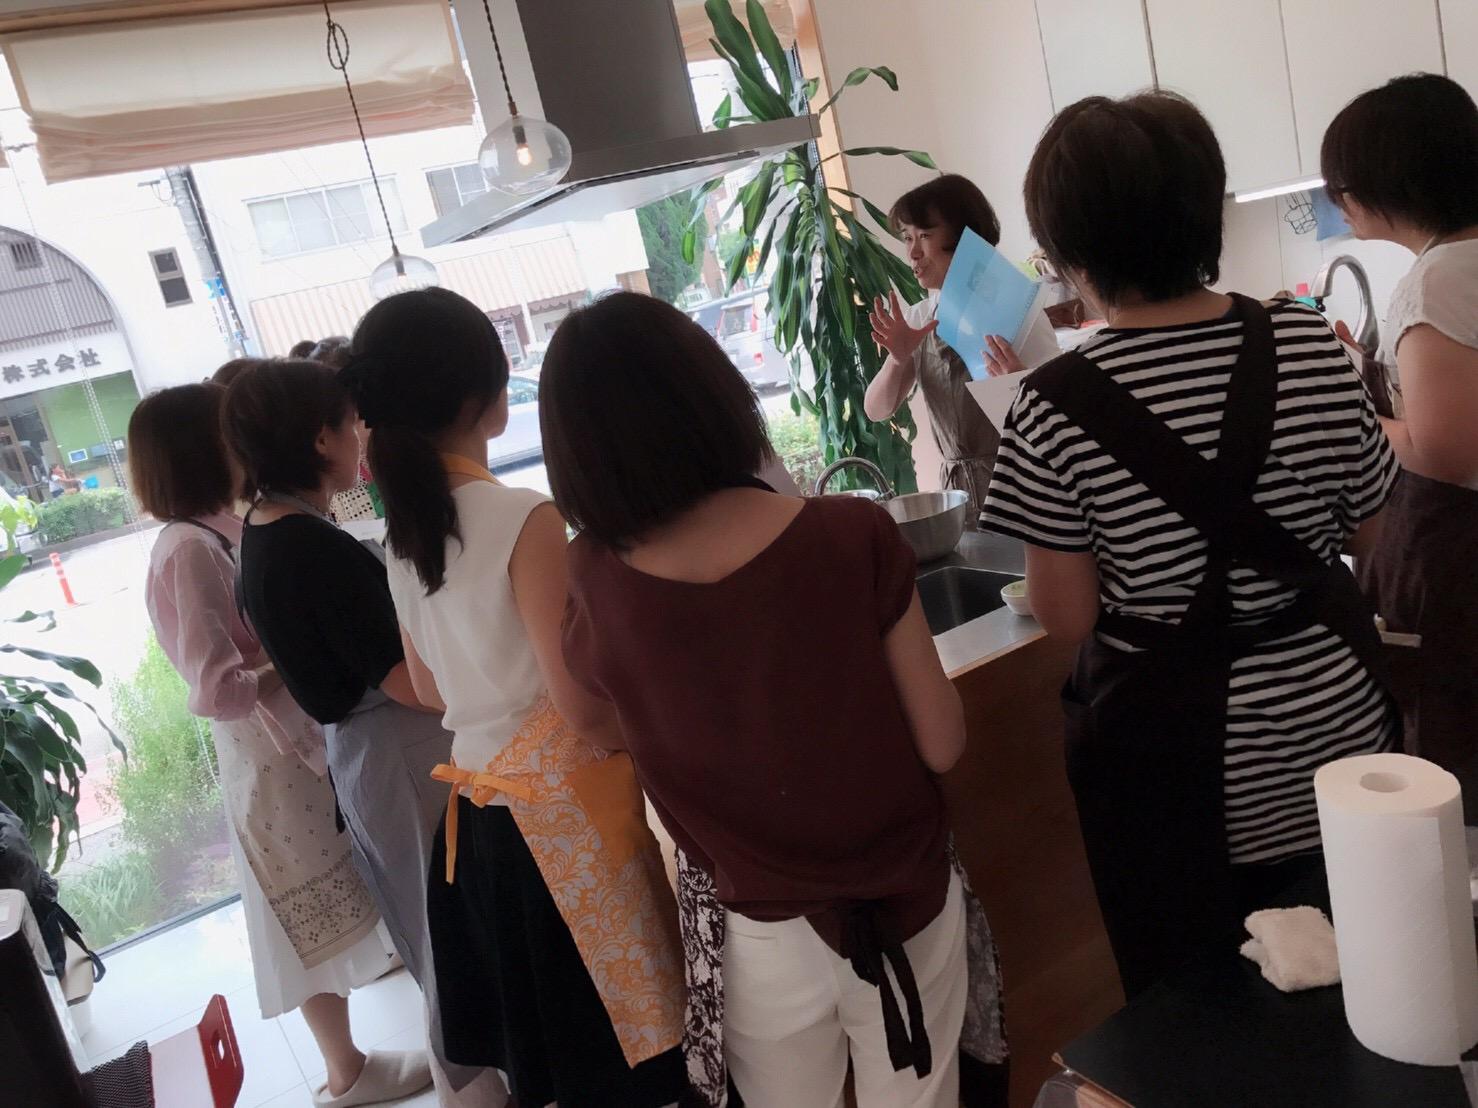 a-ta-sante糖質制限パン料理教室。京都江部粉を使った低糖質教室です。『糖質オフ・抹茶のシフォンケーキ&カルツオーネ』阿倍野区西田辺。